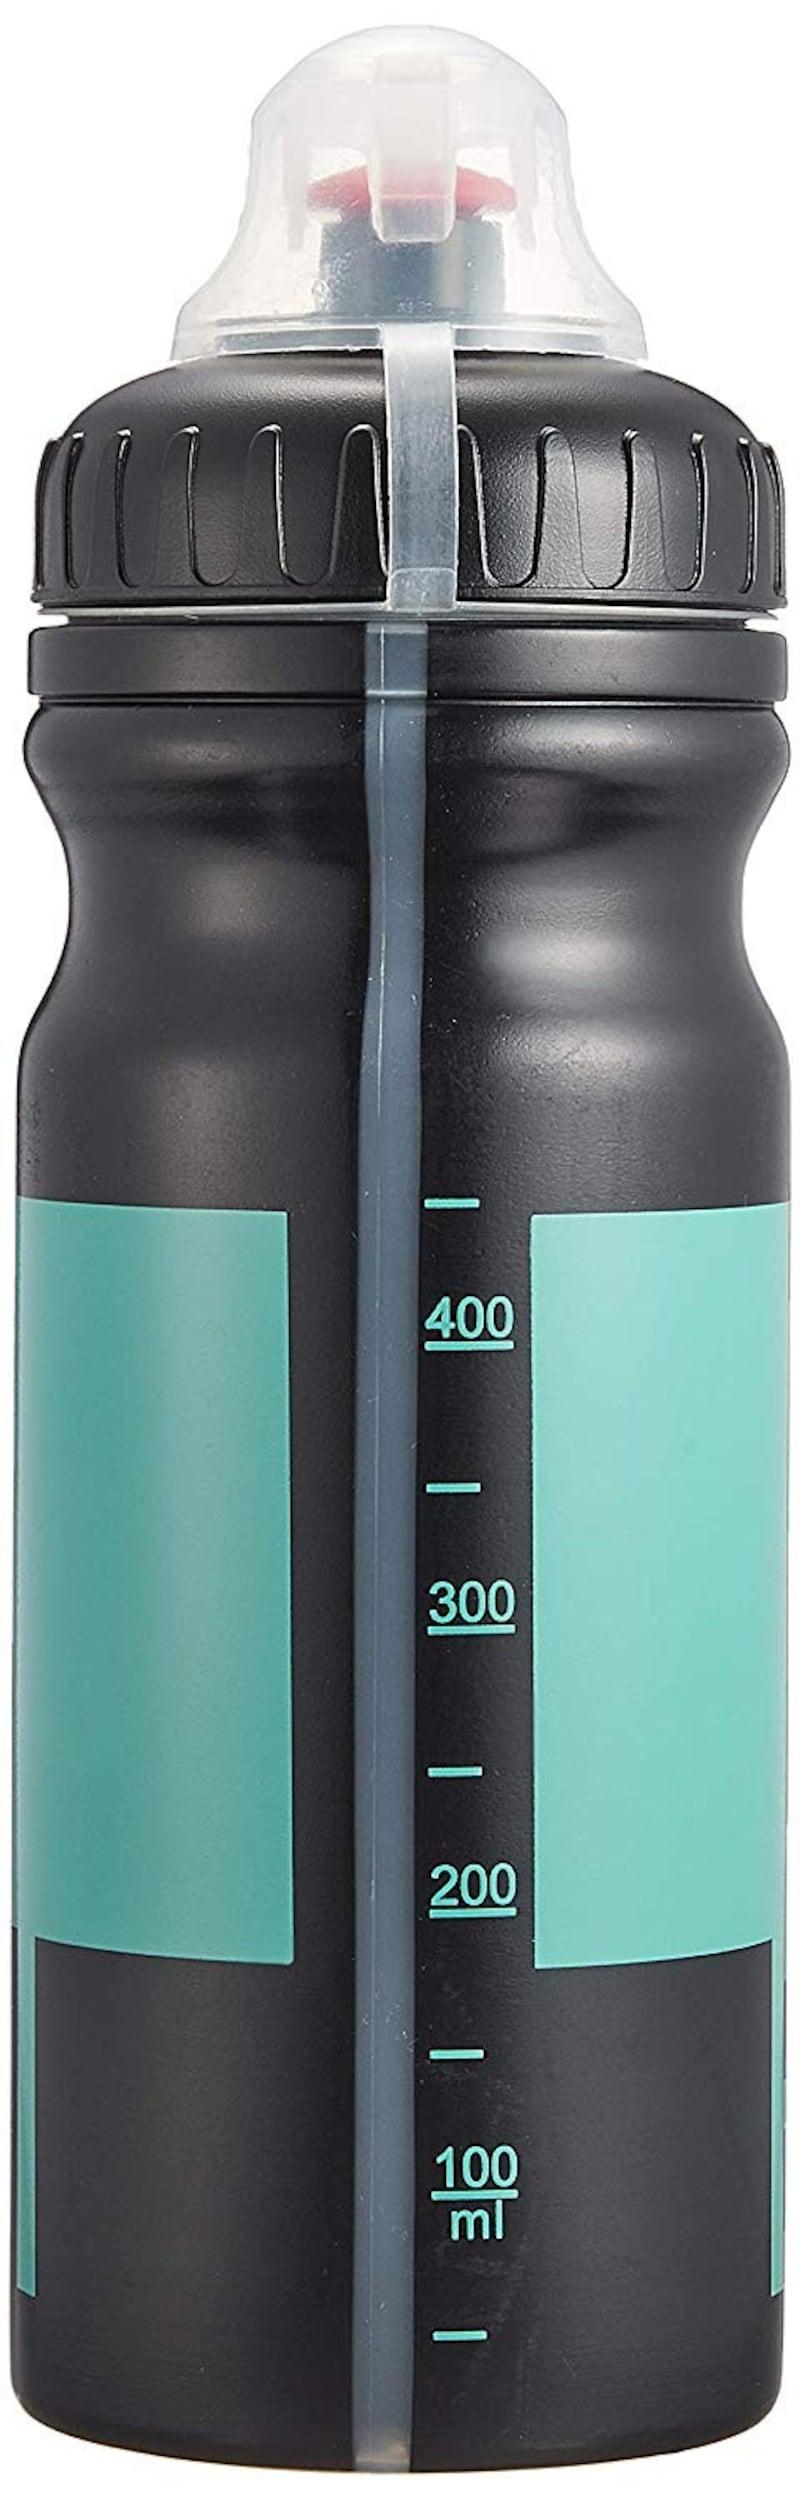 Bianchi(,Bianchi(ビアンキ) ボトル,JPA0207001BK000